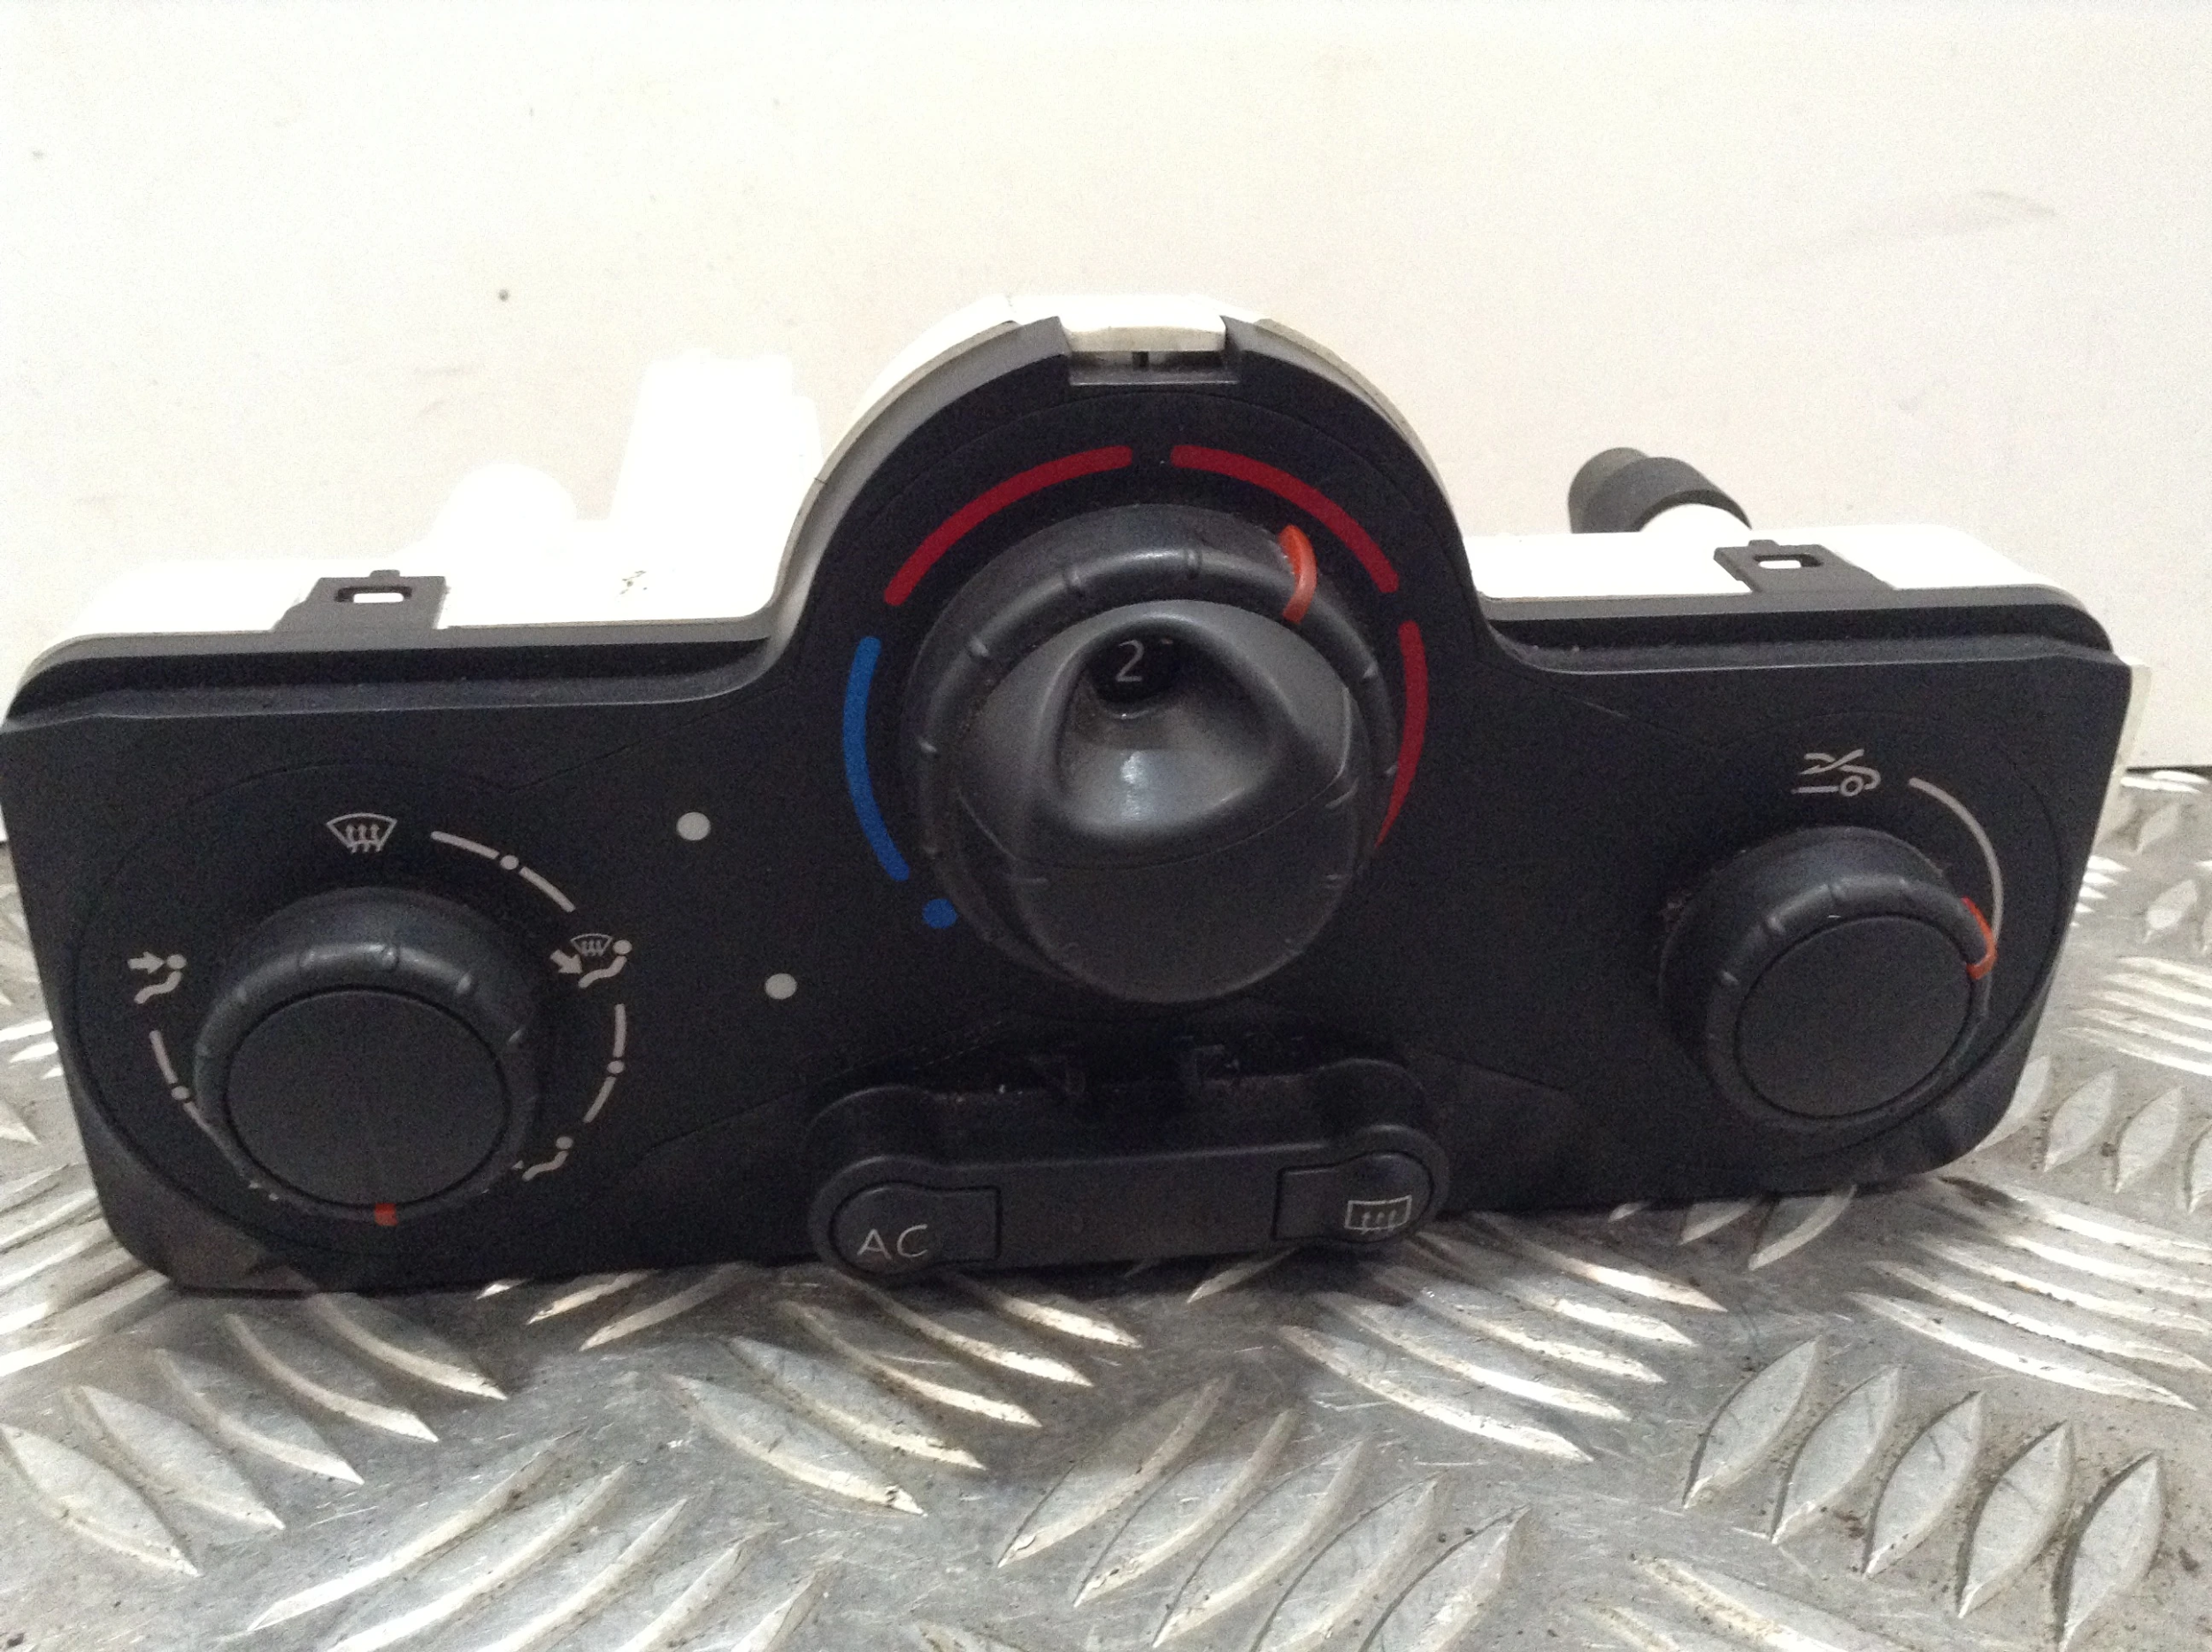 Ölfilterschlüssel Suzuki VZ 800 UZ Intruder M800 2x Hiflo Ölfilter HF138